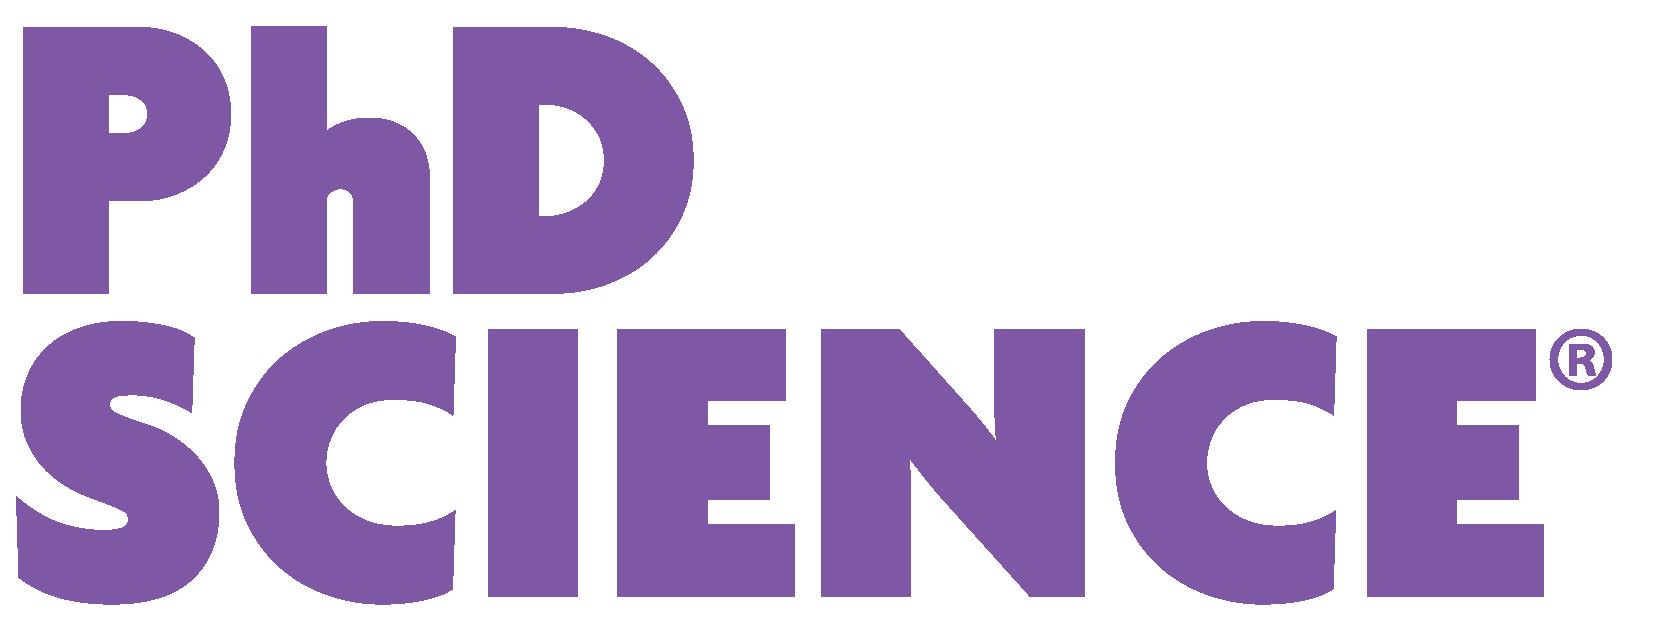 1_Great Minds_Logos_PhD-1